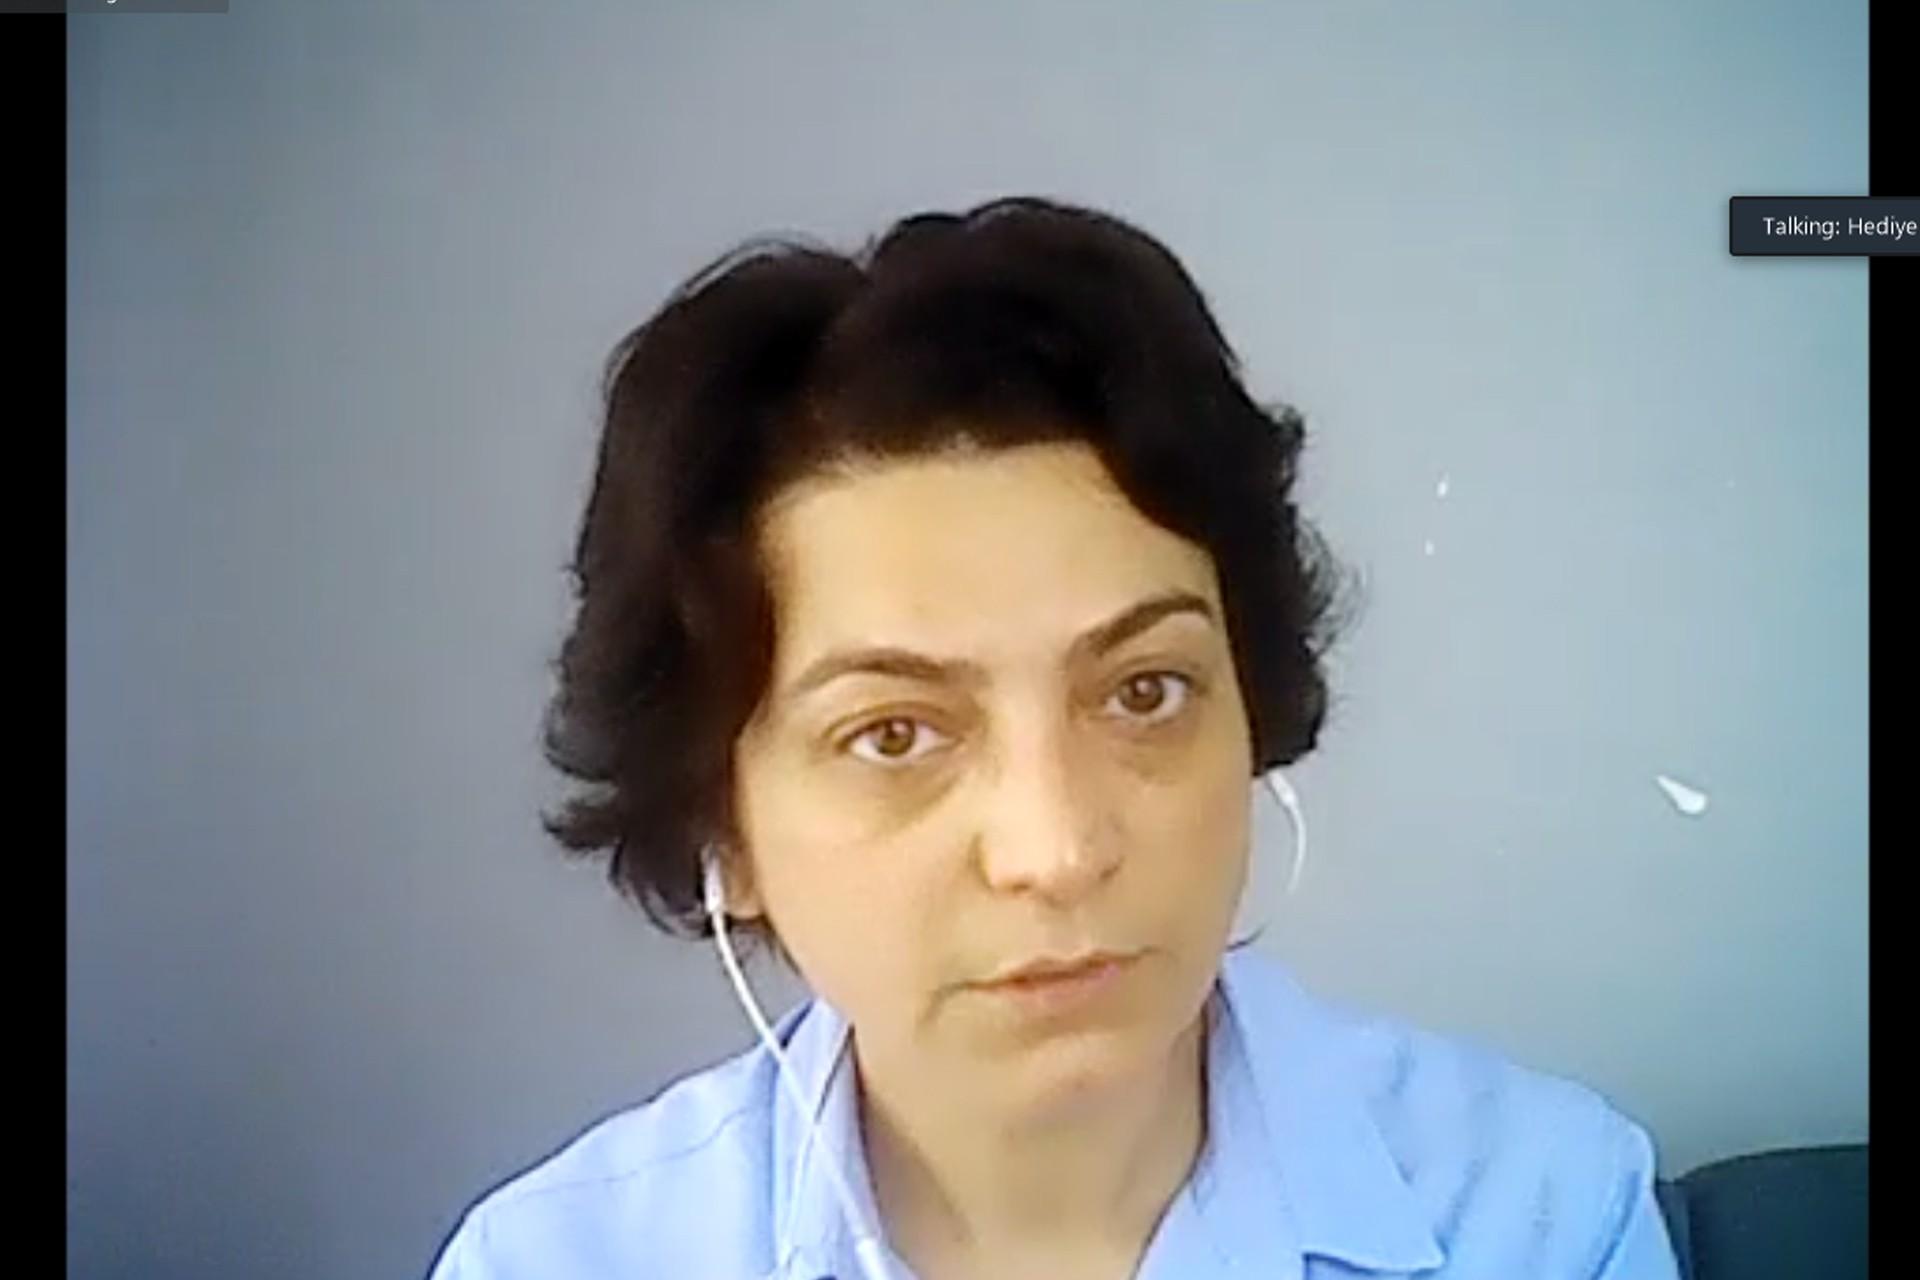 Hediye Levent